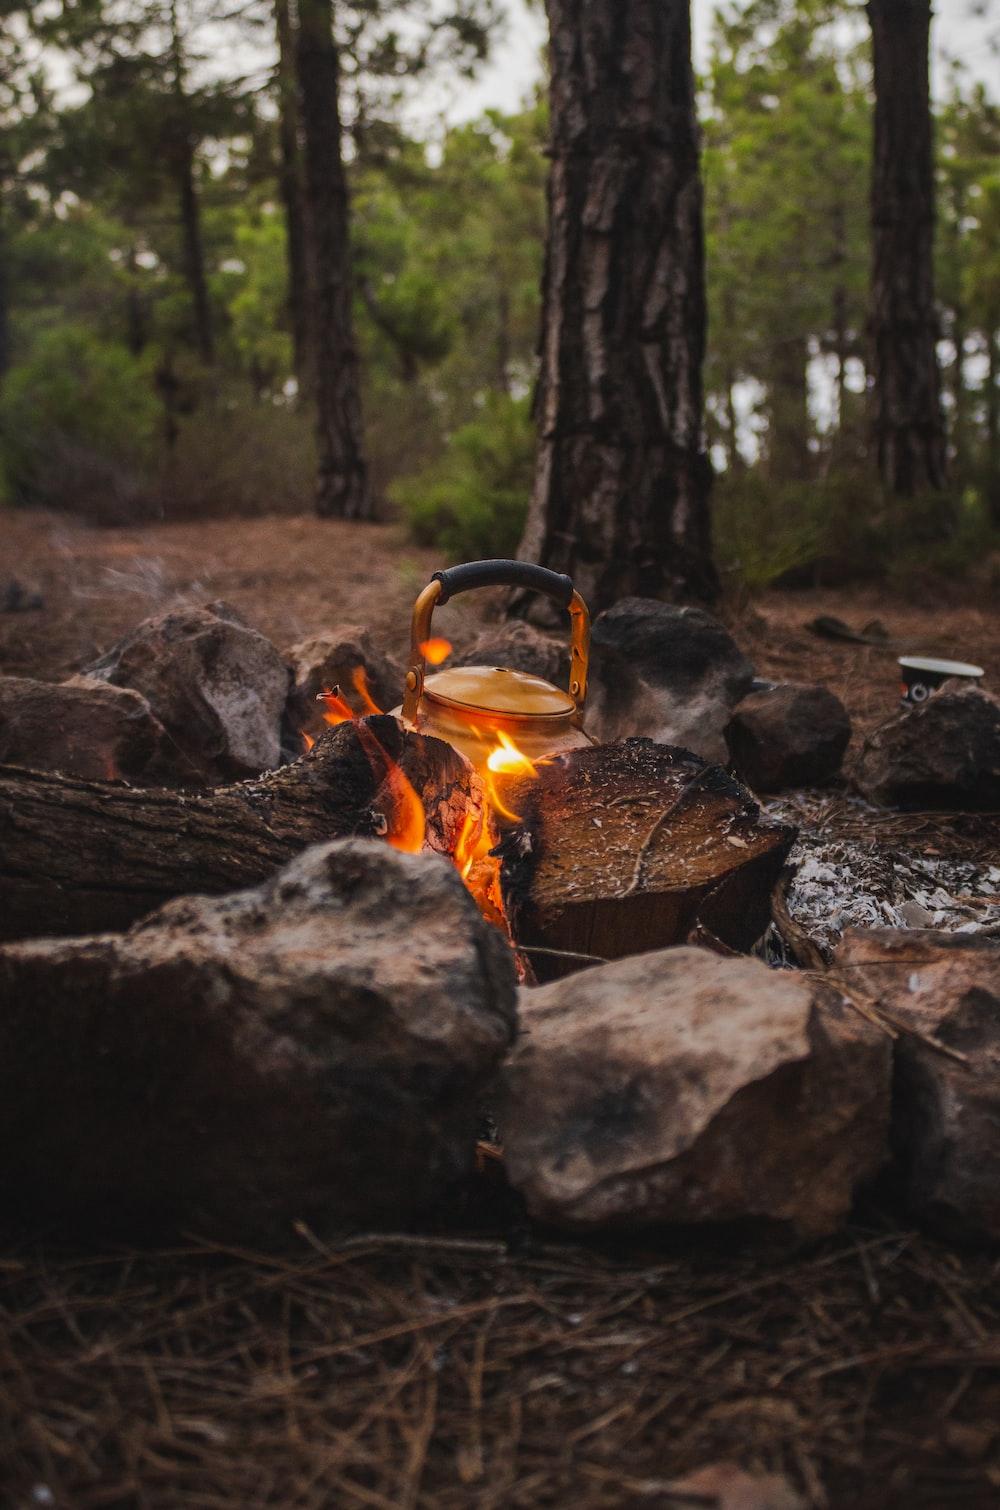 grey metal pot on burning fire